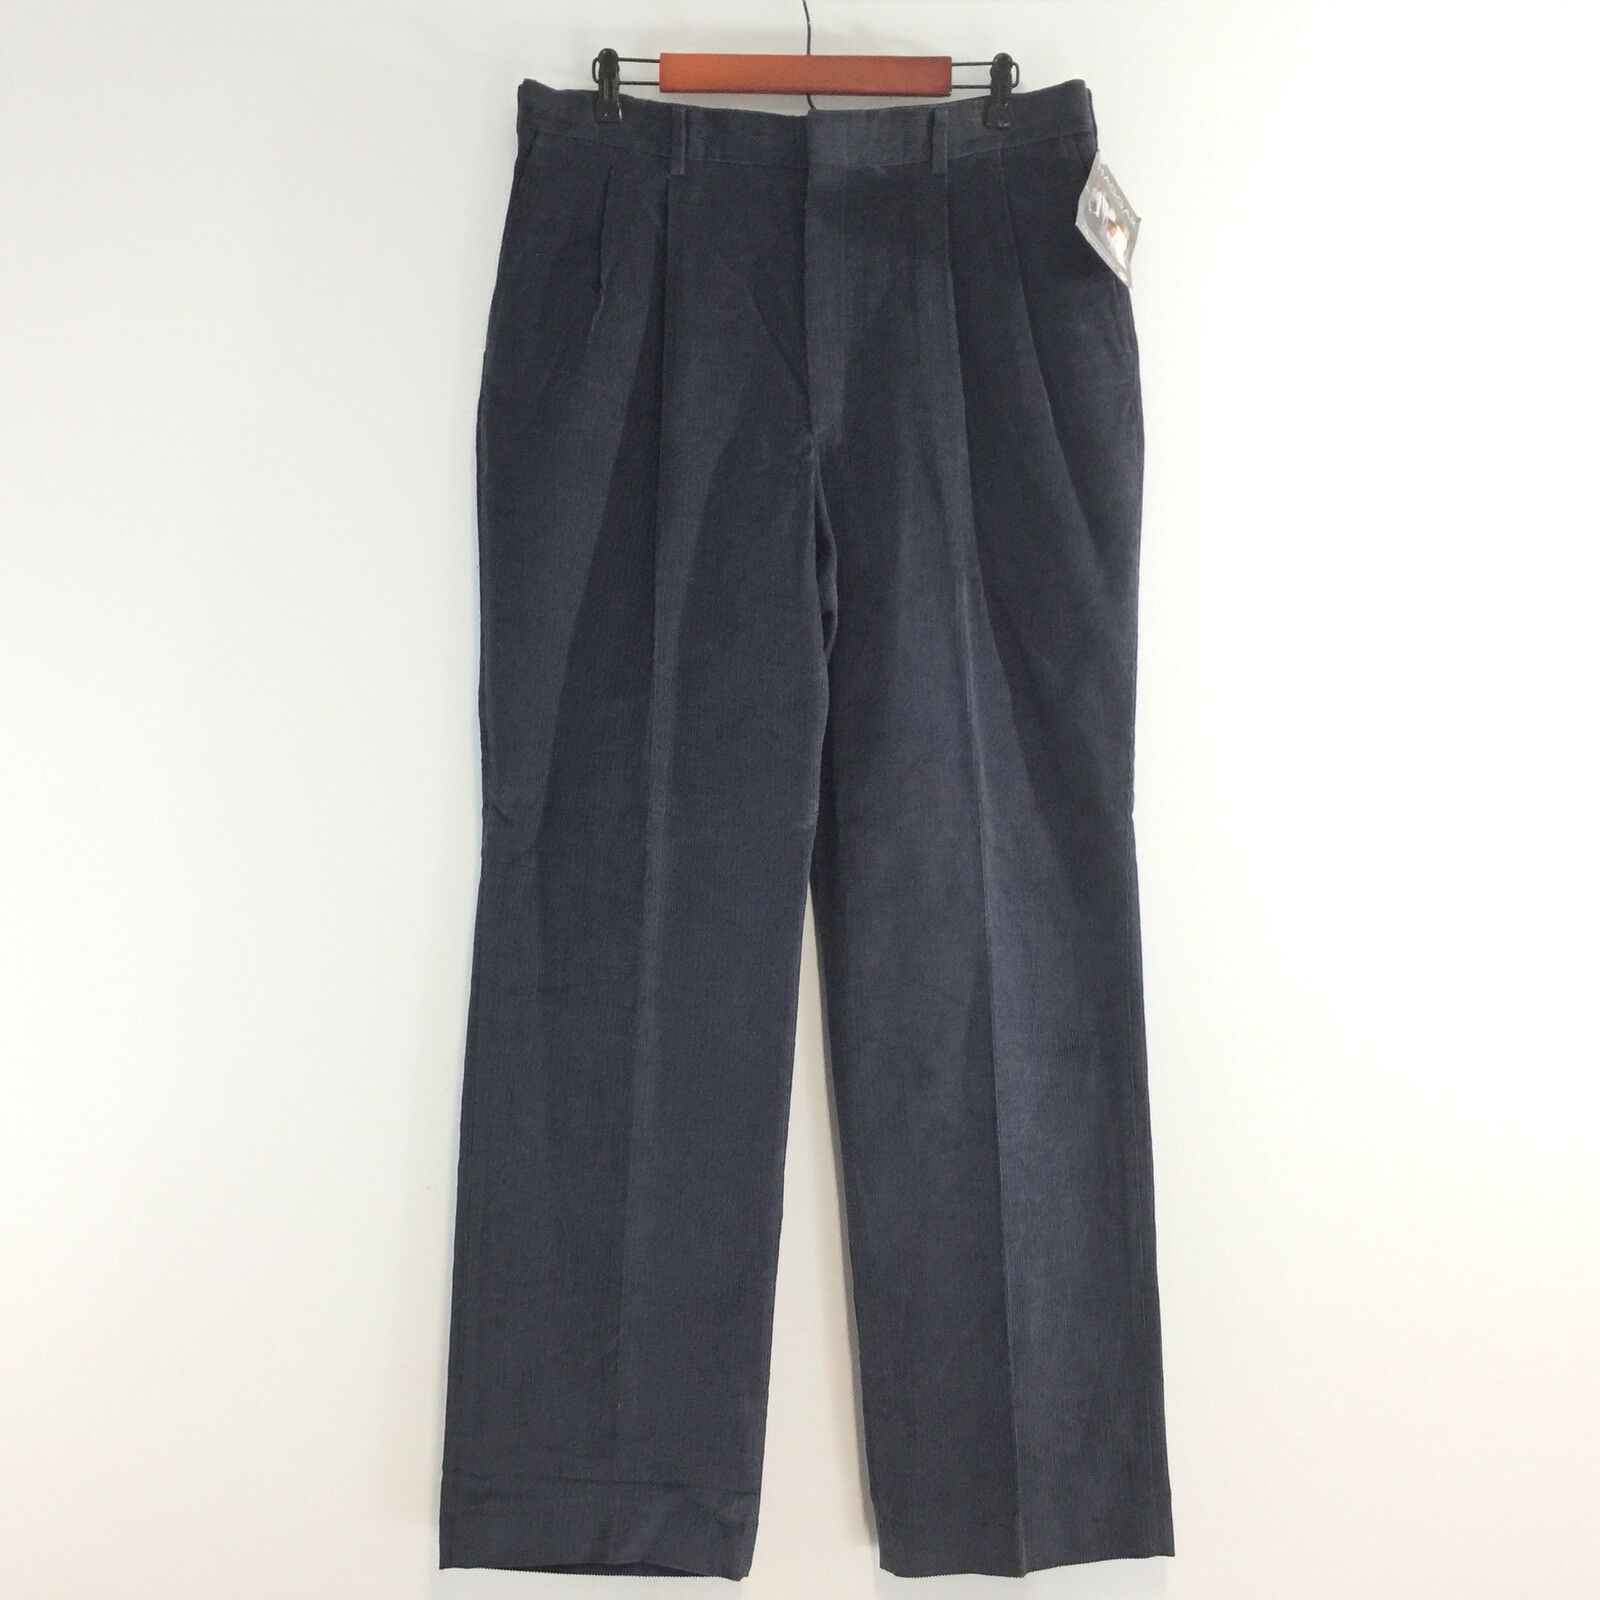 Vtg 90s NEW Haggar Mens W36xL32 bluee Easy Care Corduroy Pants USA Made NWT 36x32